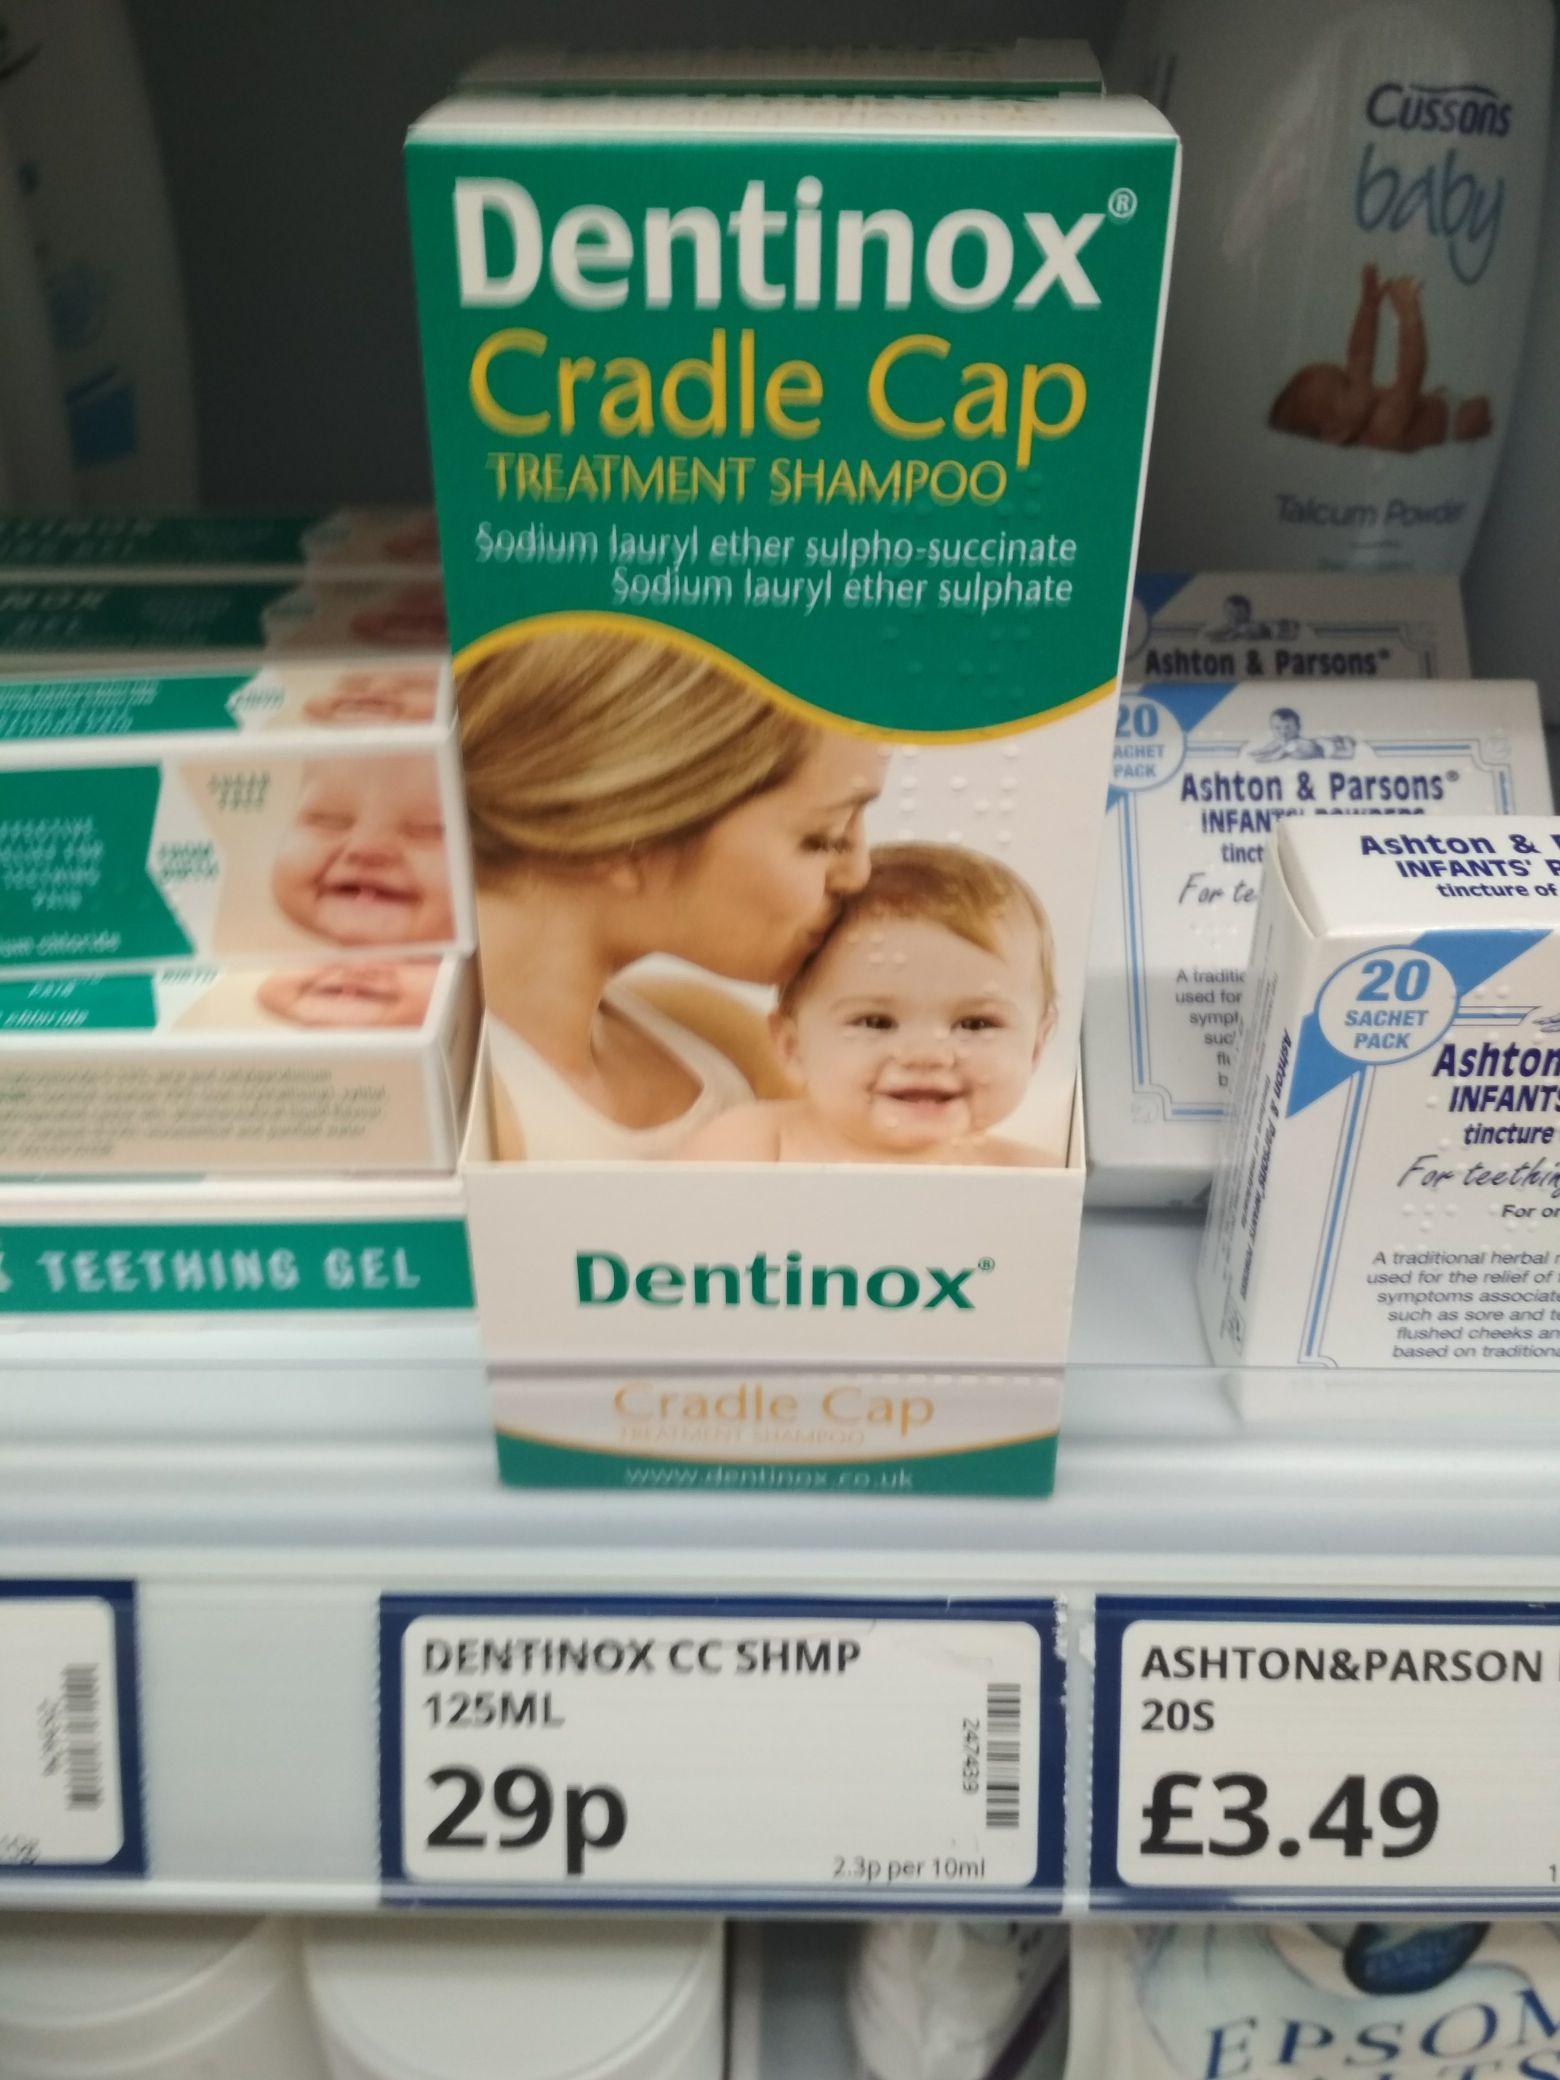 Dentinox cradle cap shampoo 29p @ poundstretcher folkestone